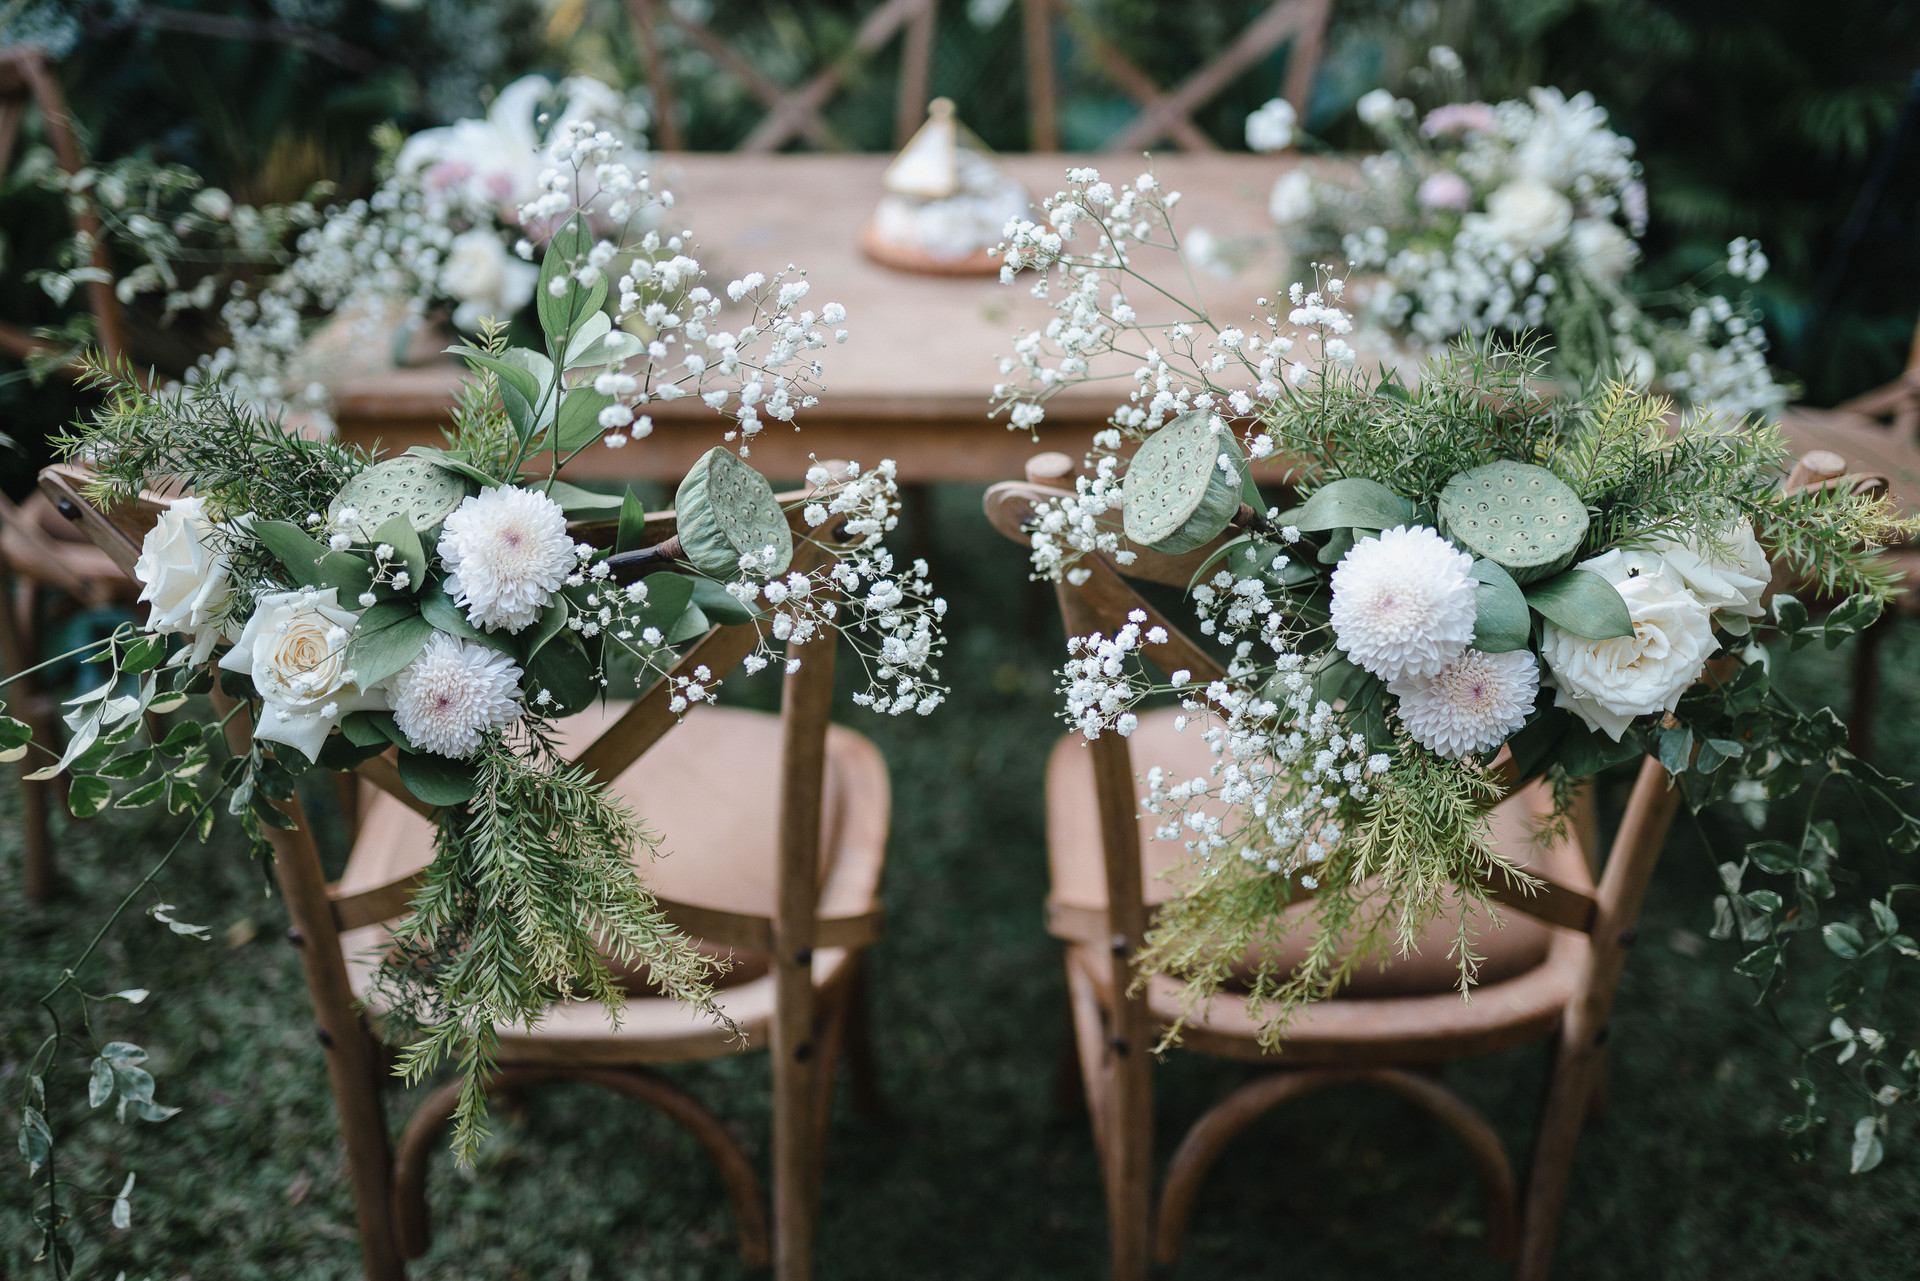 ALIF-WEDHA-WEDDING-17.jpg